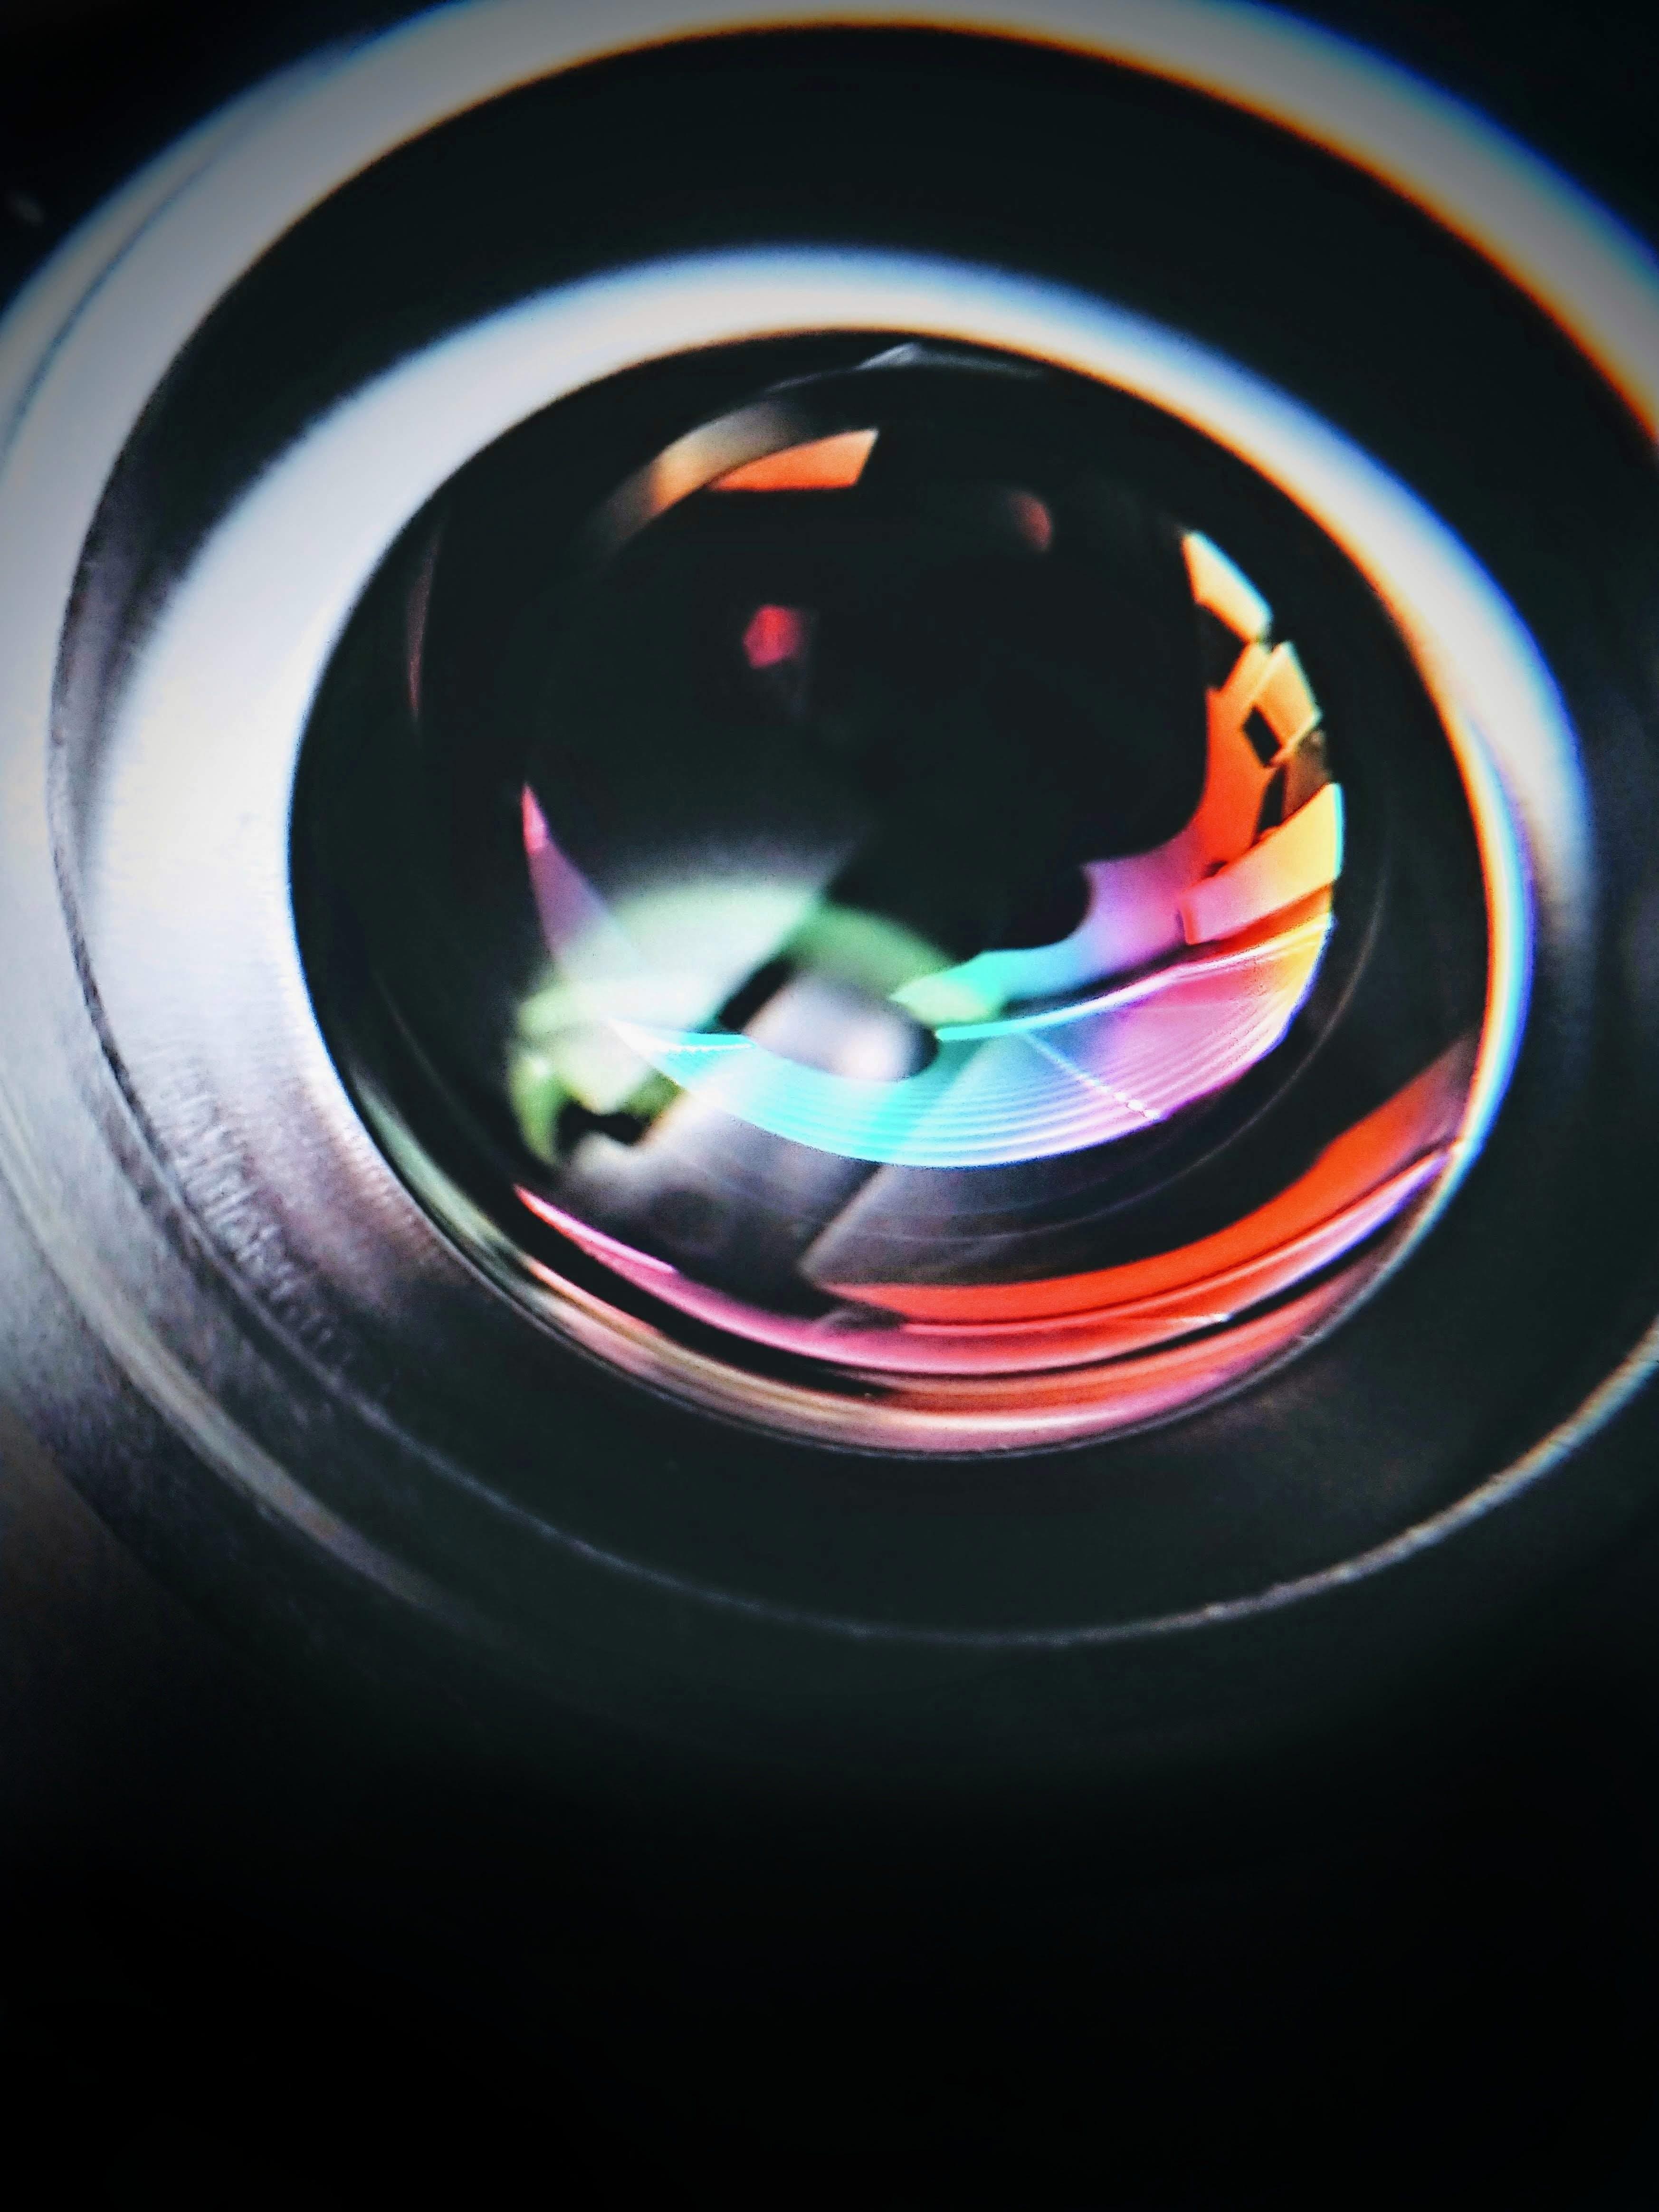 Free stock photo of abstract, camera, colors, dark